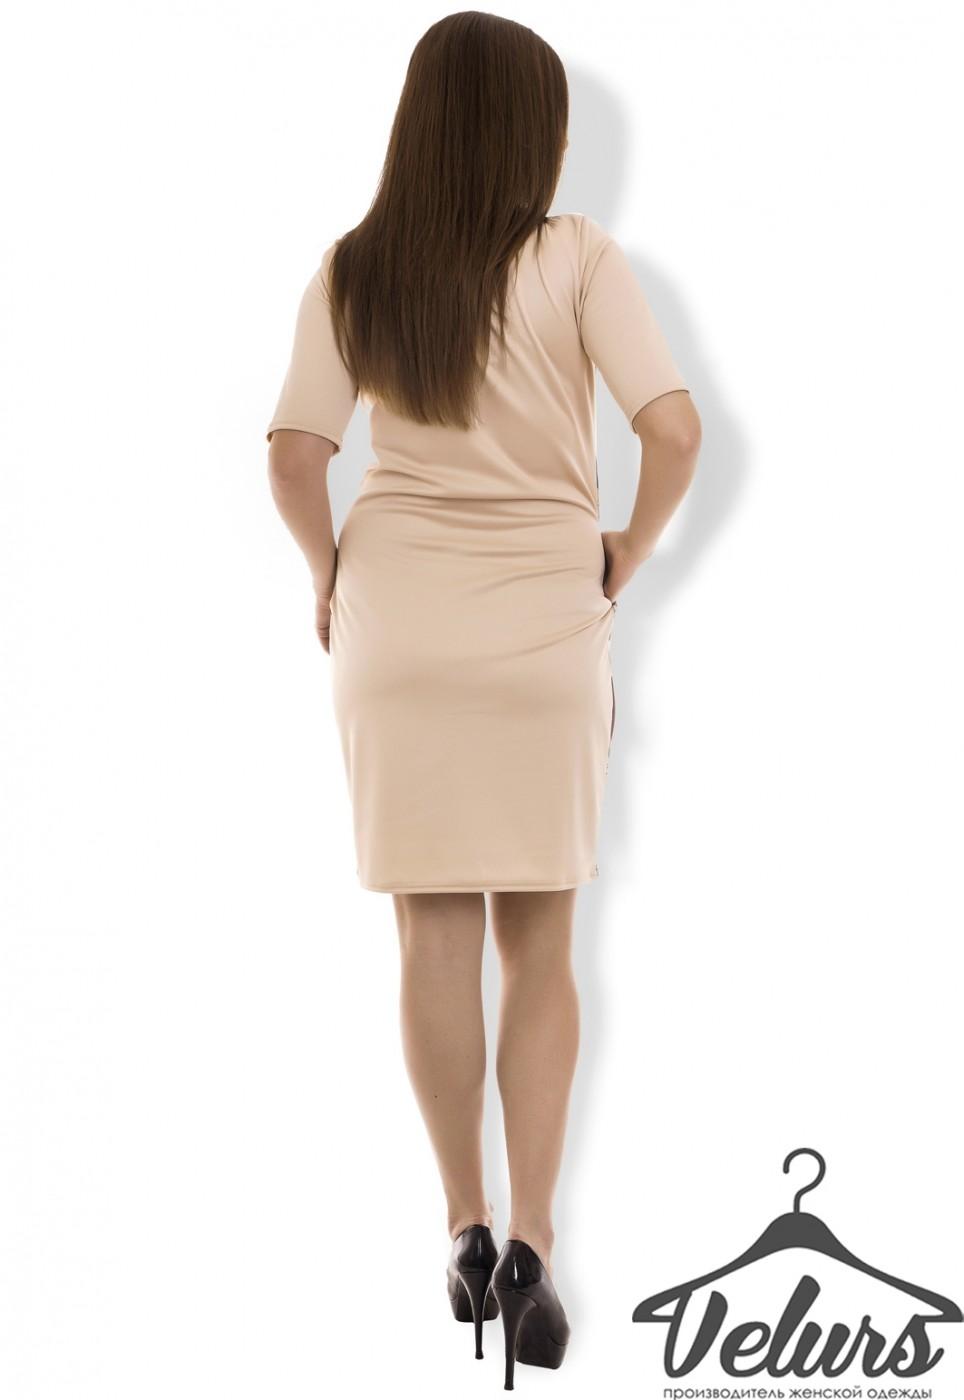 Velurs: Платье 212110 - фото 21